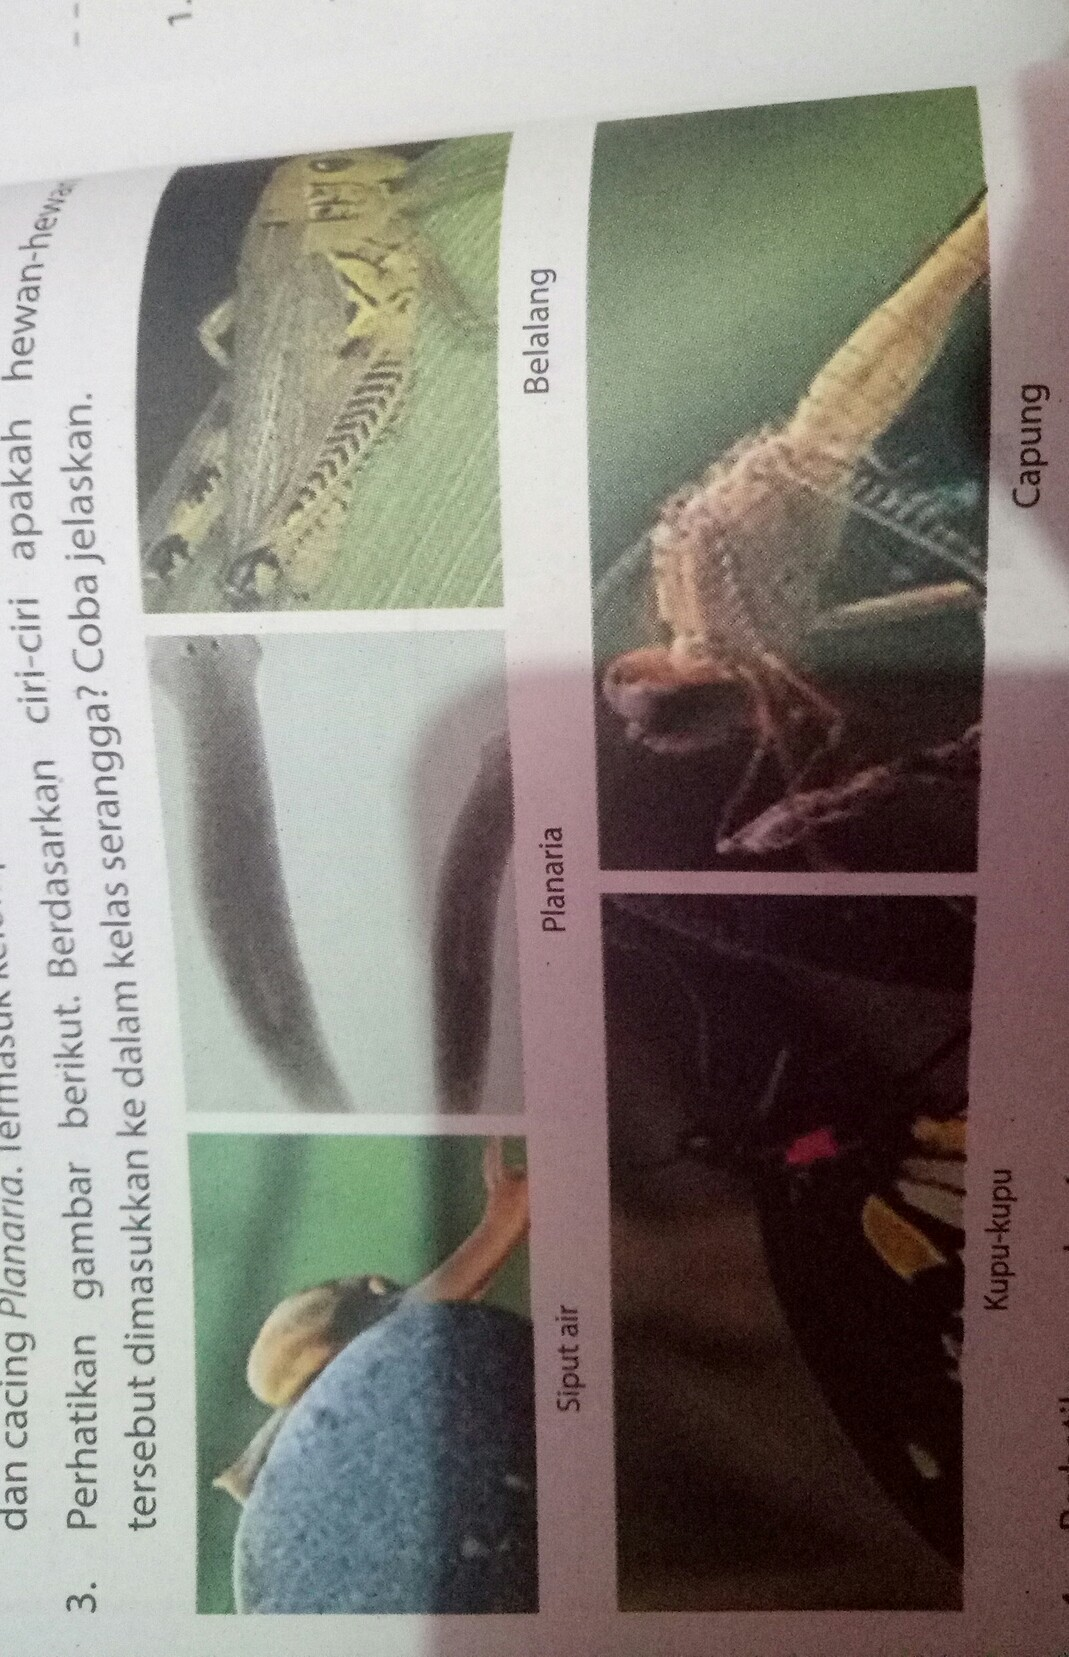 perhatikan gambar berikut berdasarkan ciri ciri apakah ...